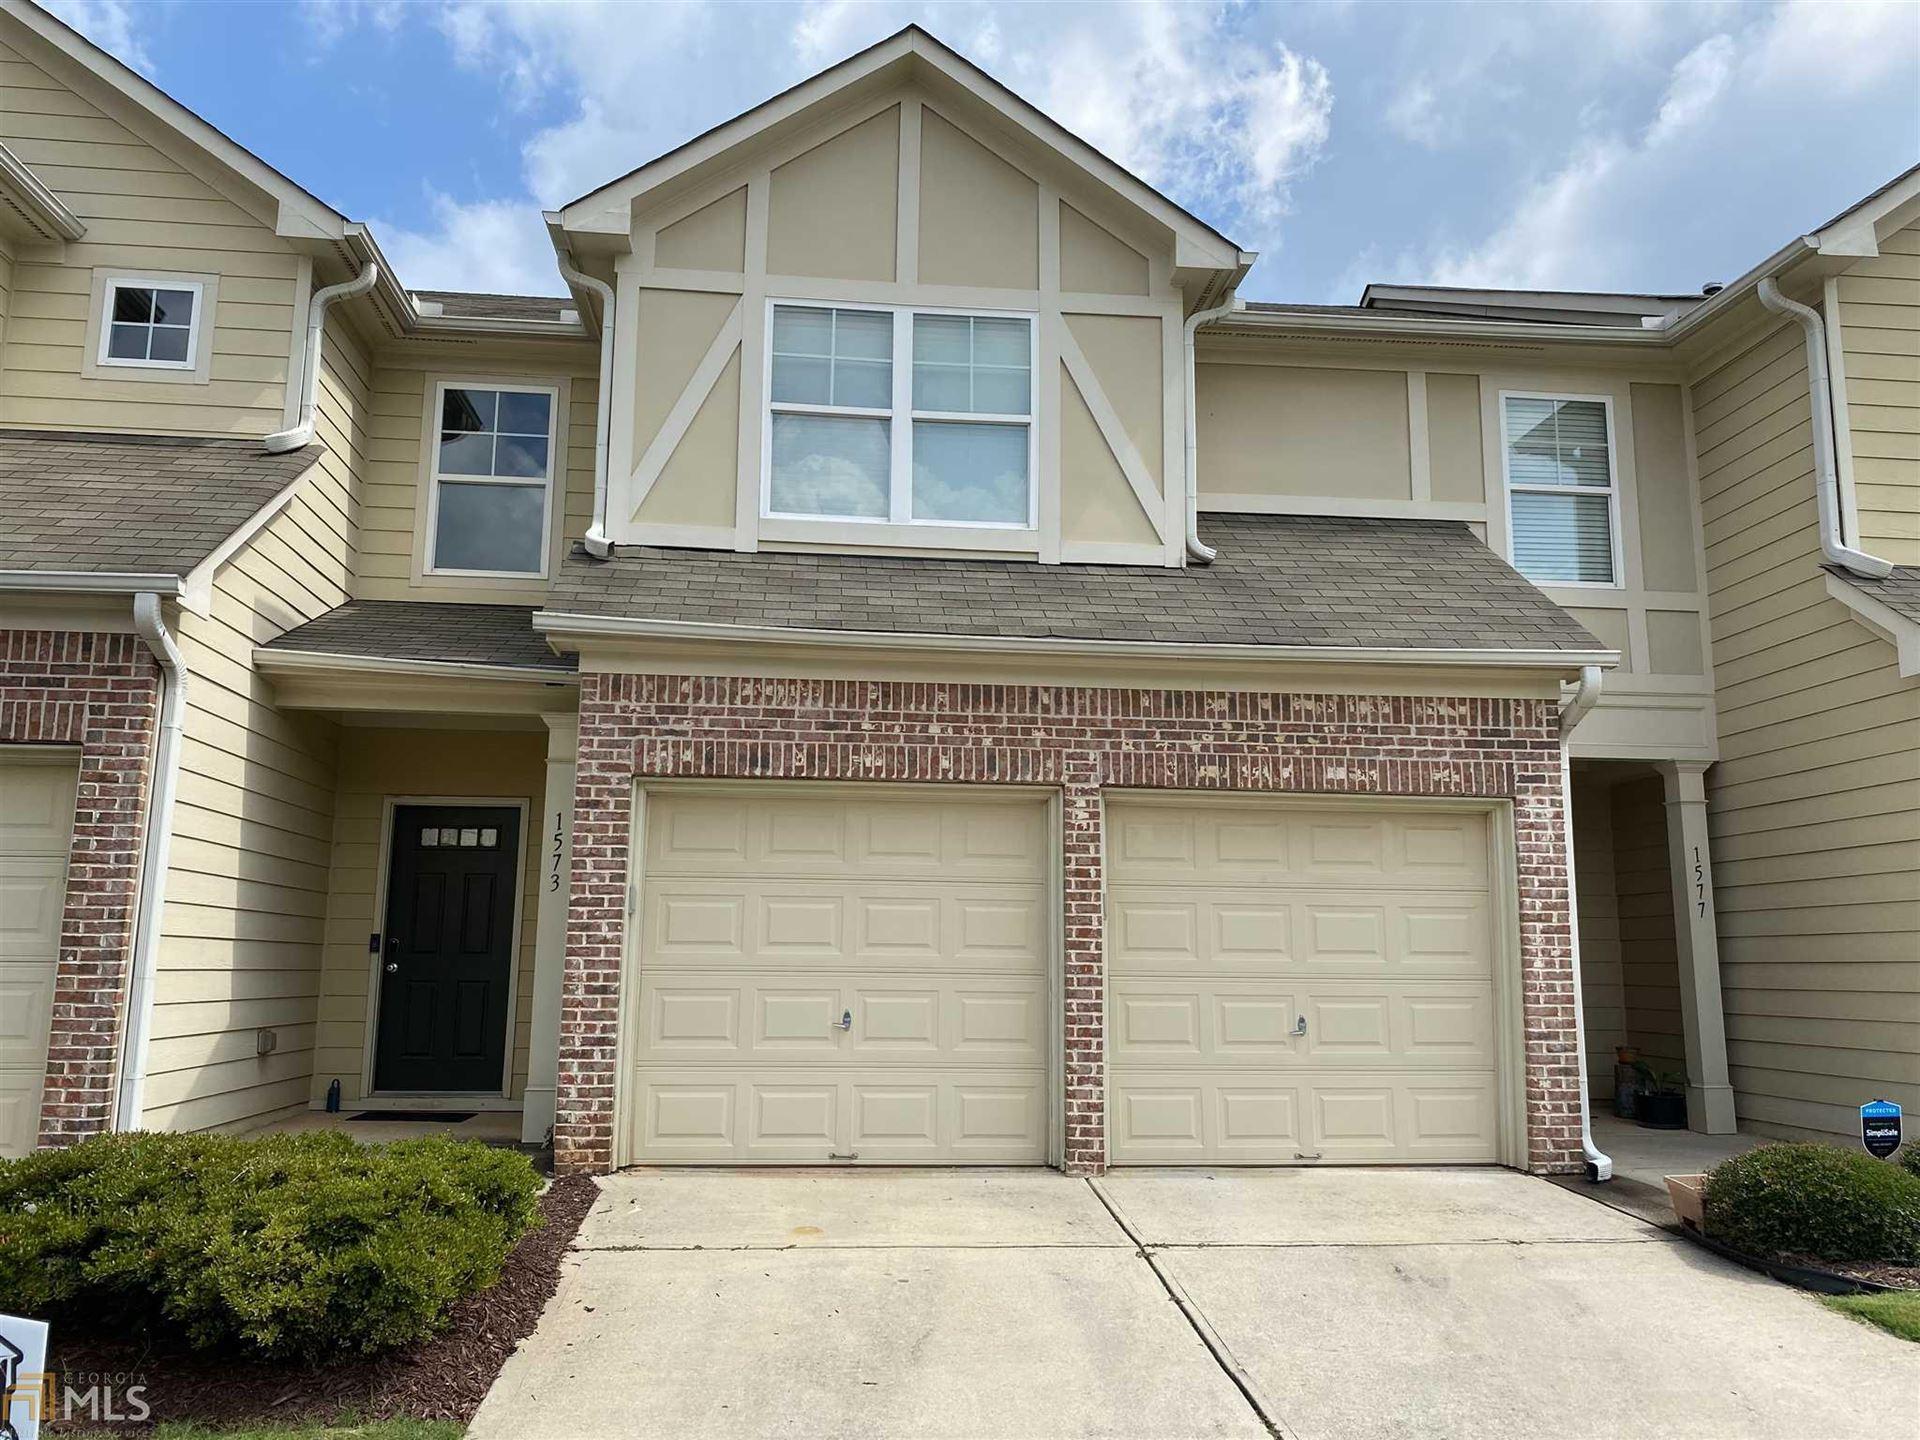 1573 Park Brooke Cir, Marietta, GA 30008 - MLS#: 8805085